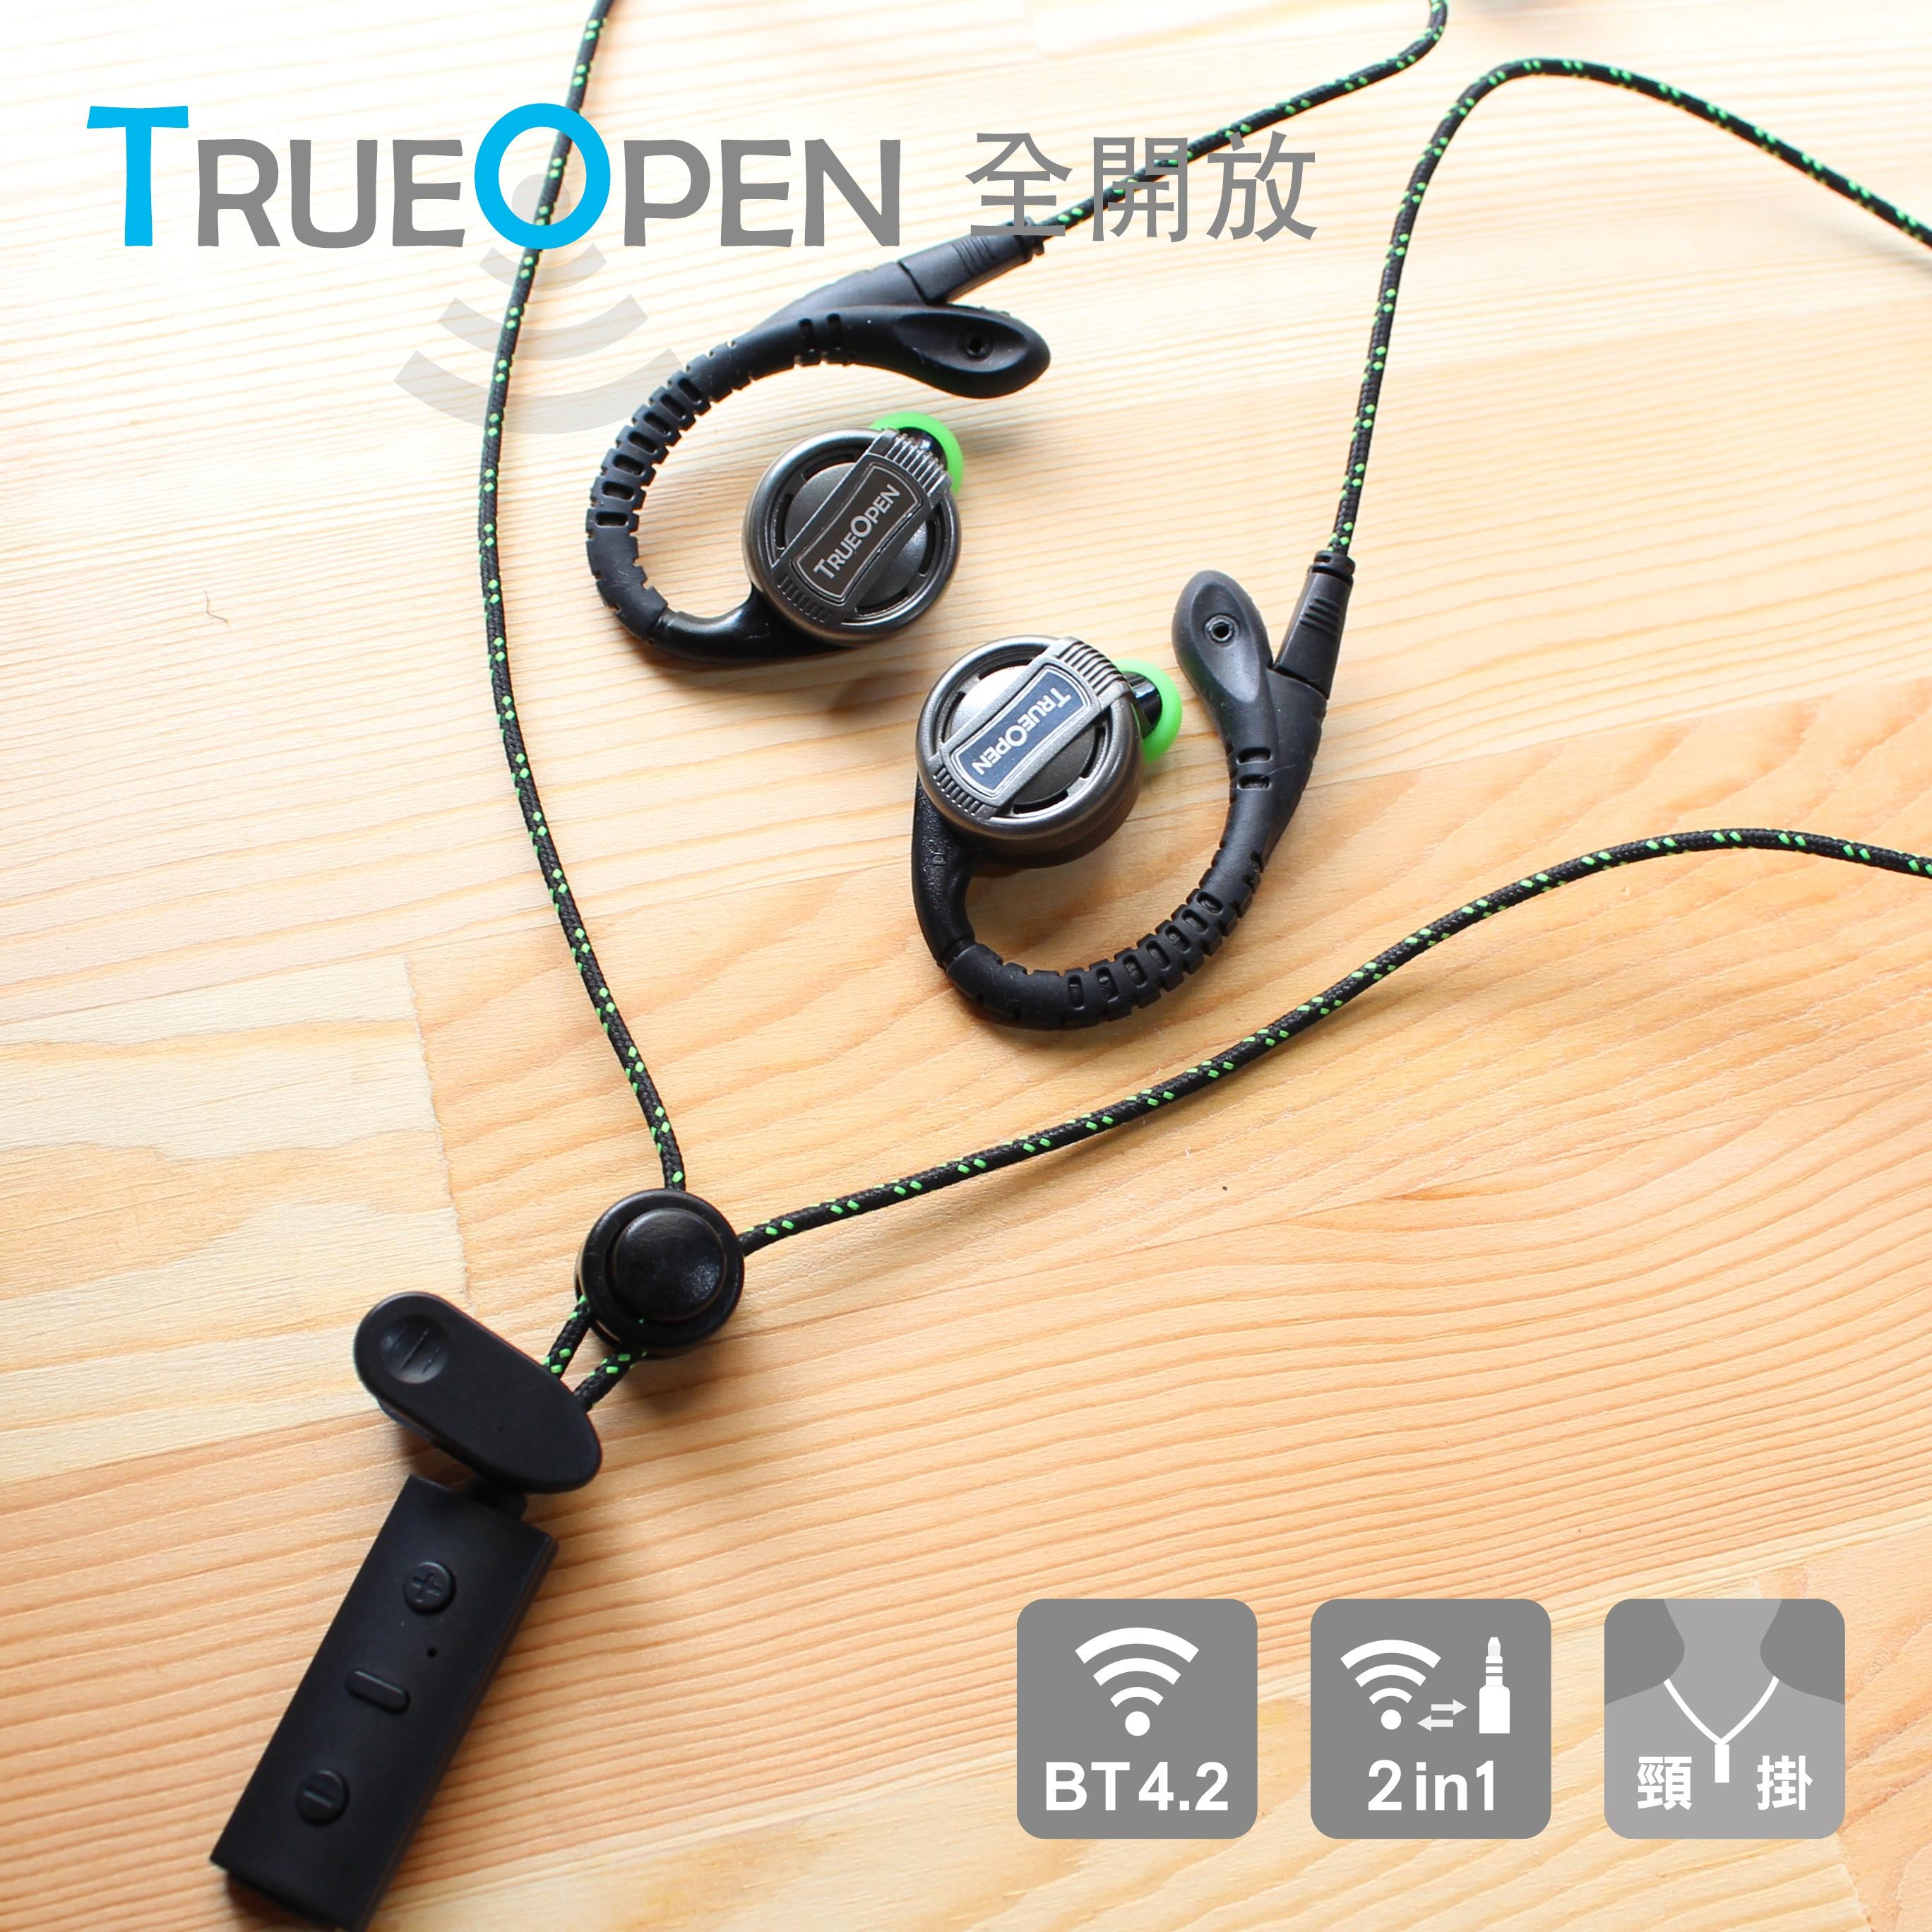 TOPlay聽不累 二合一藍牙耳機 螢光綠-防潑水 頸掛式 工作 運動 直播耳機-[BT001]